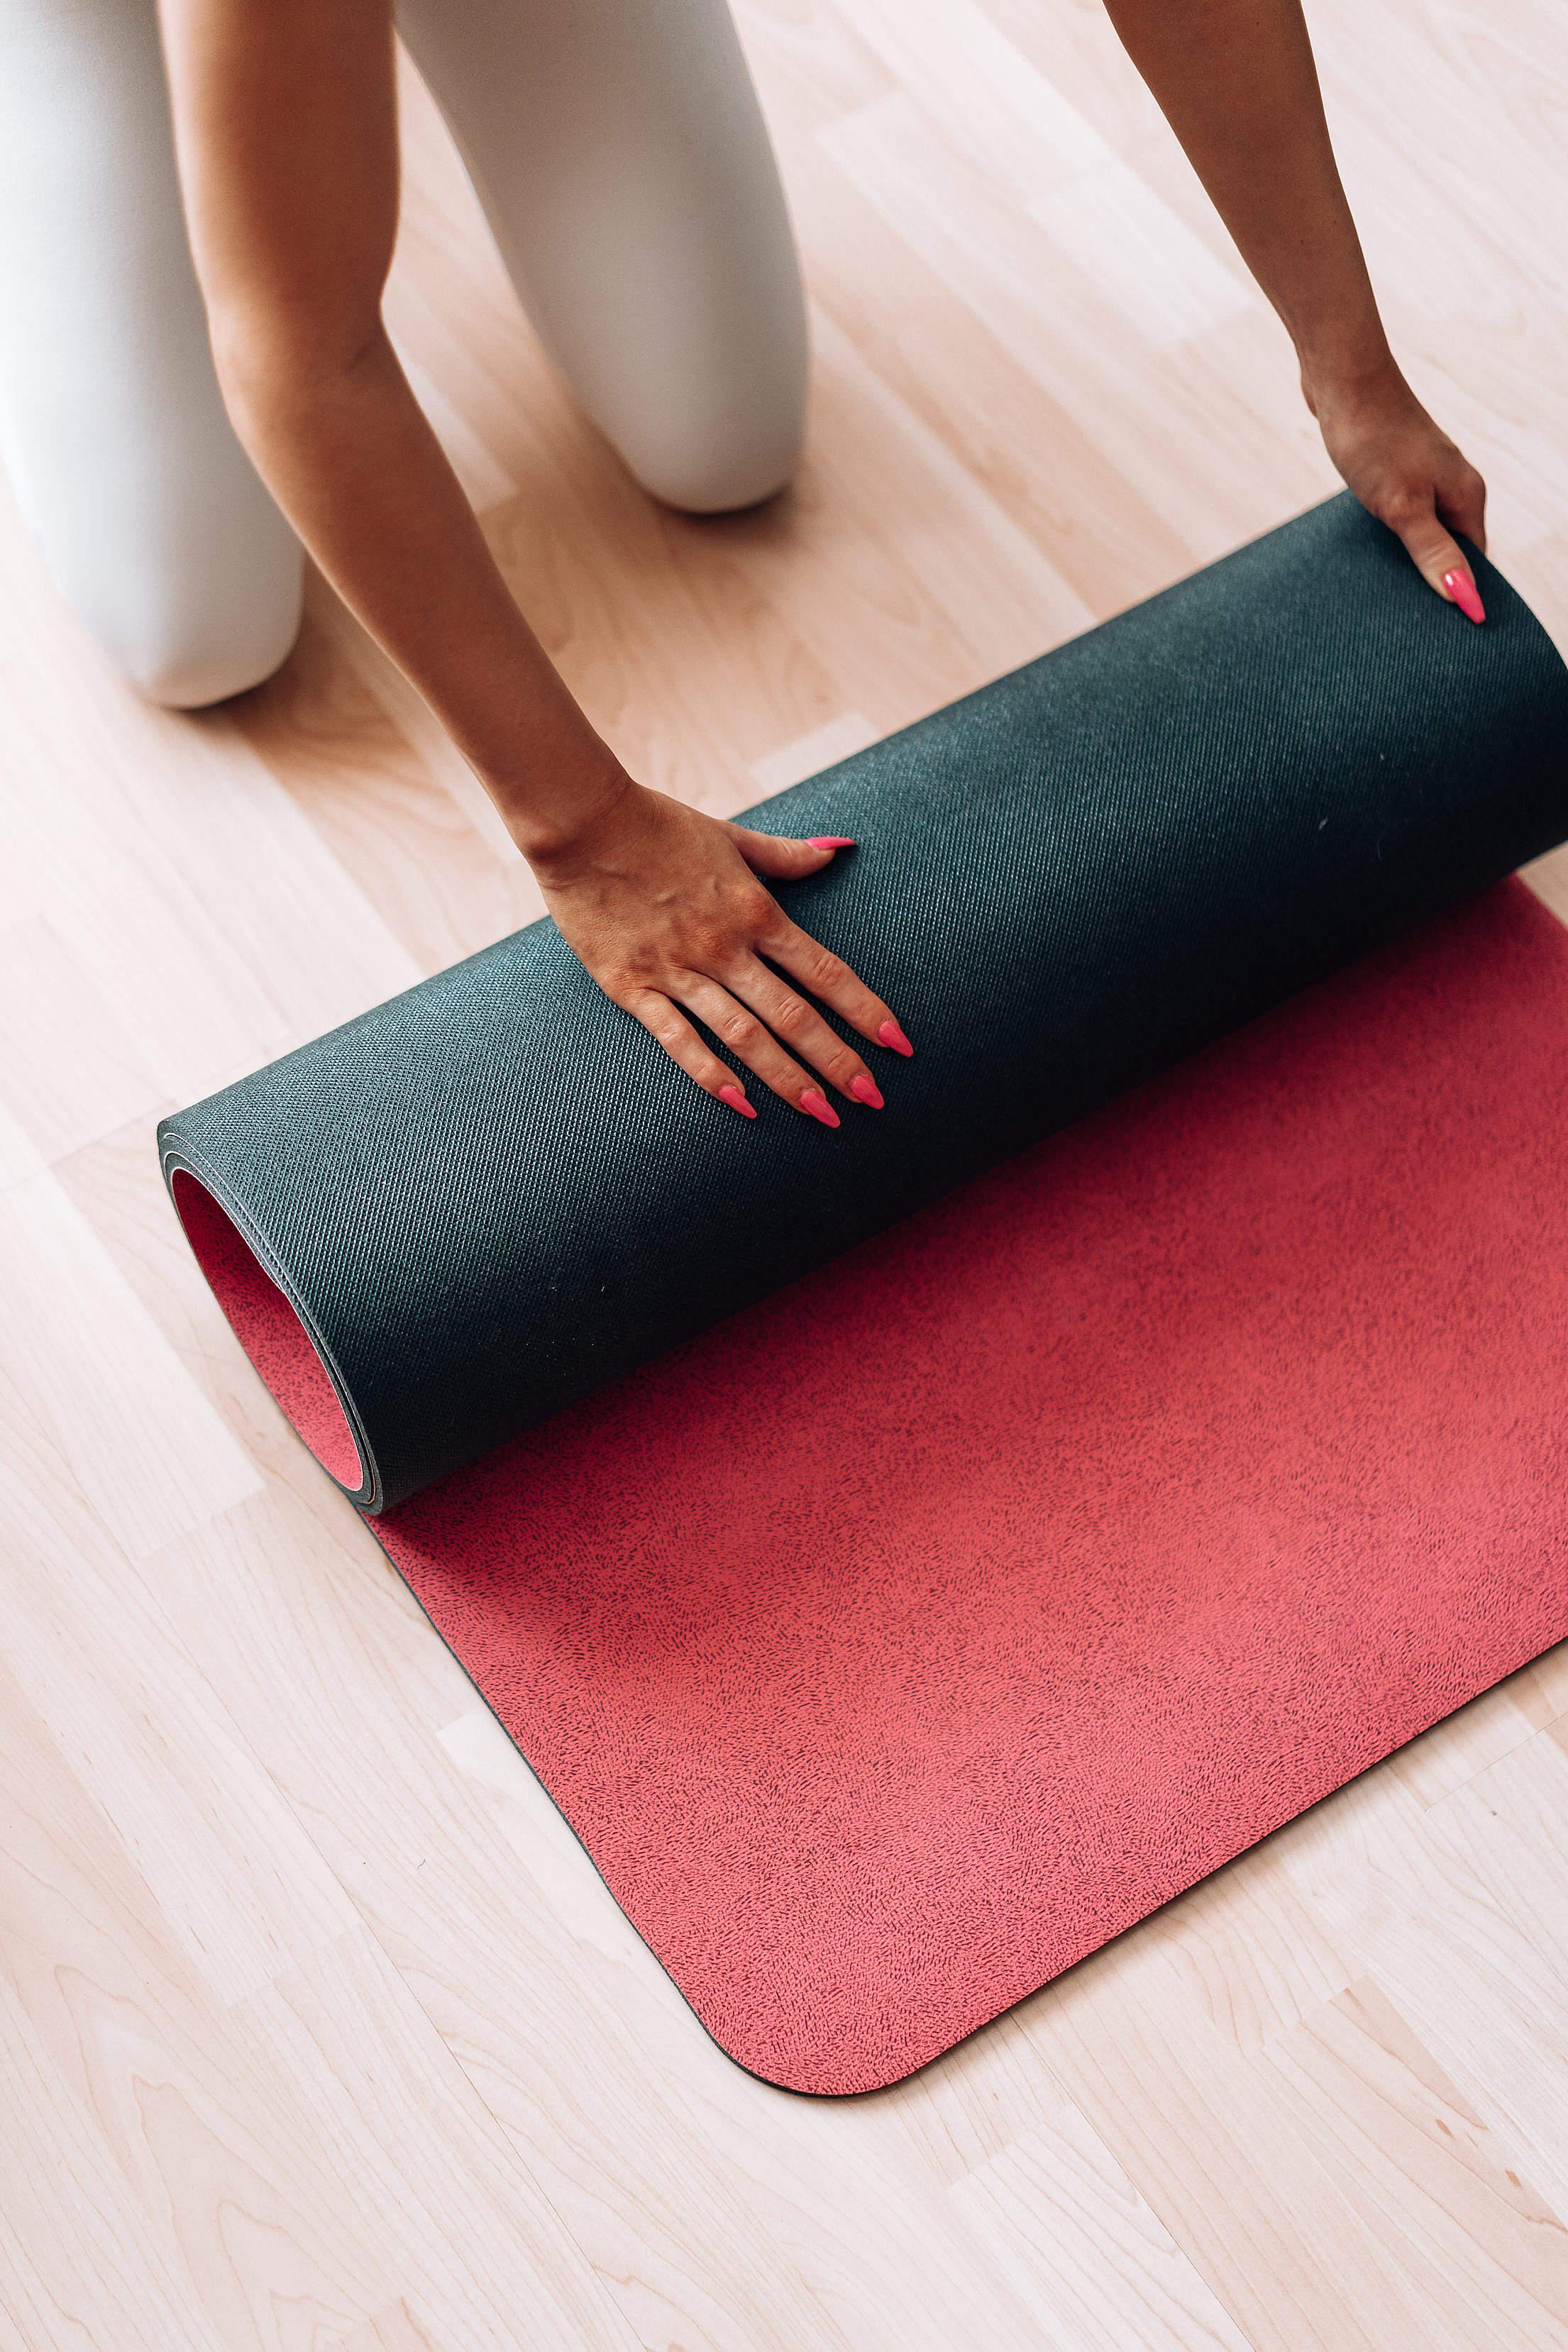 Yoga Mat Home Exercise Free Stock Photo